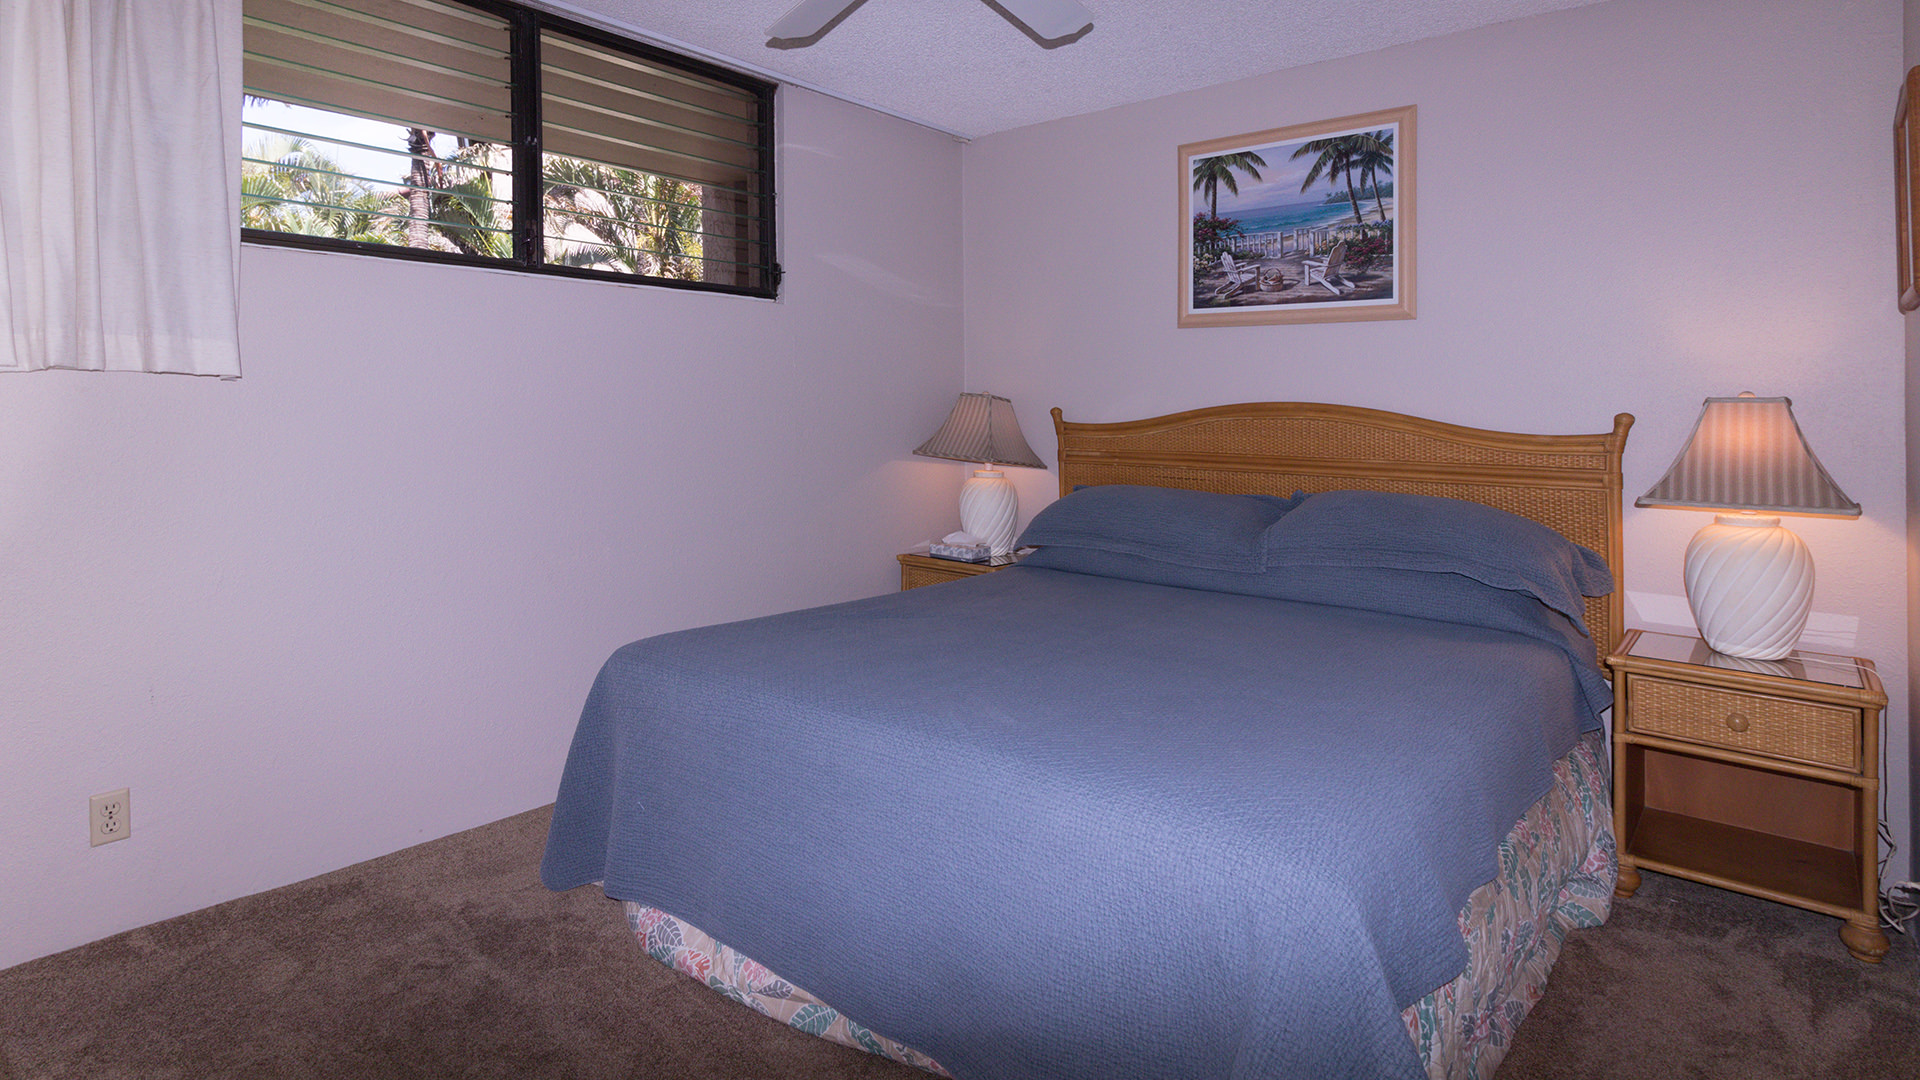 A206 Bedroom